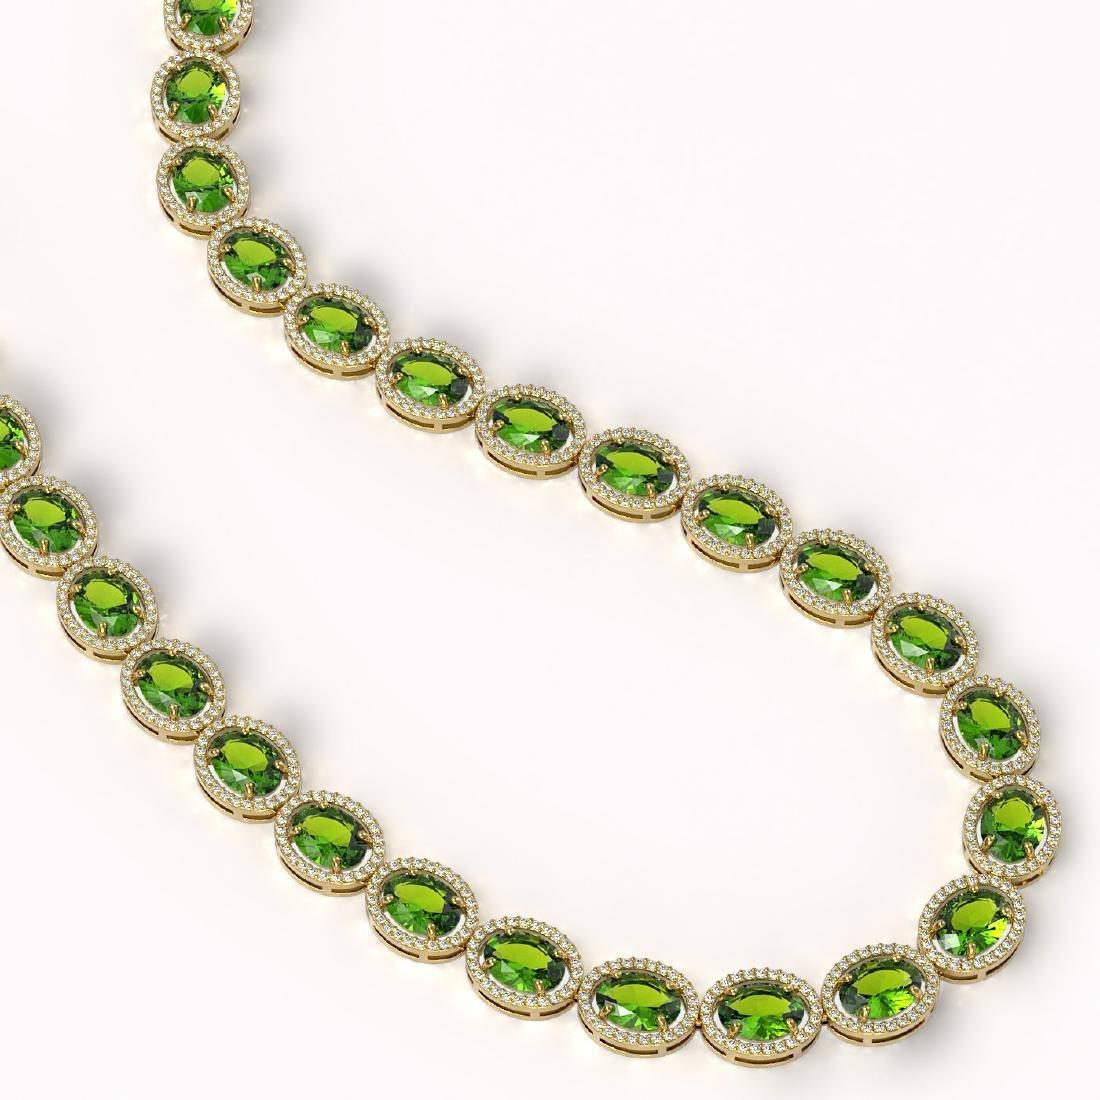 64.84 CTW Peridot & Diamond Halo Necklace 10K Yellow - 2